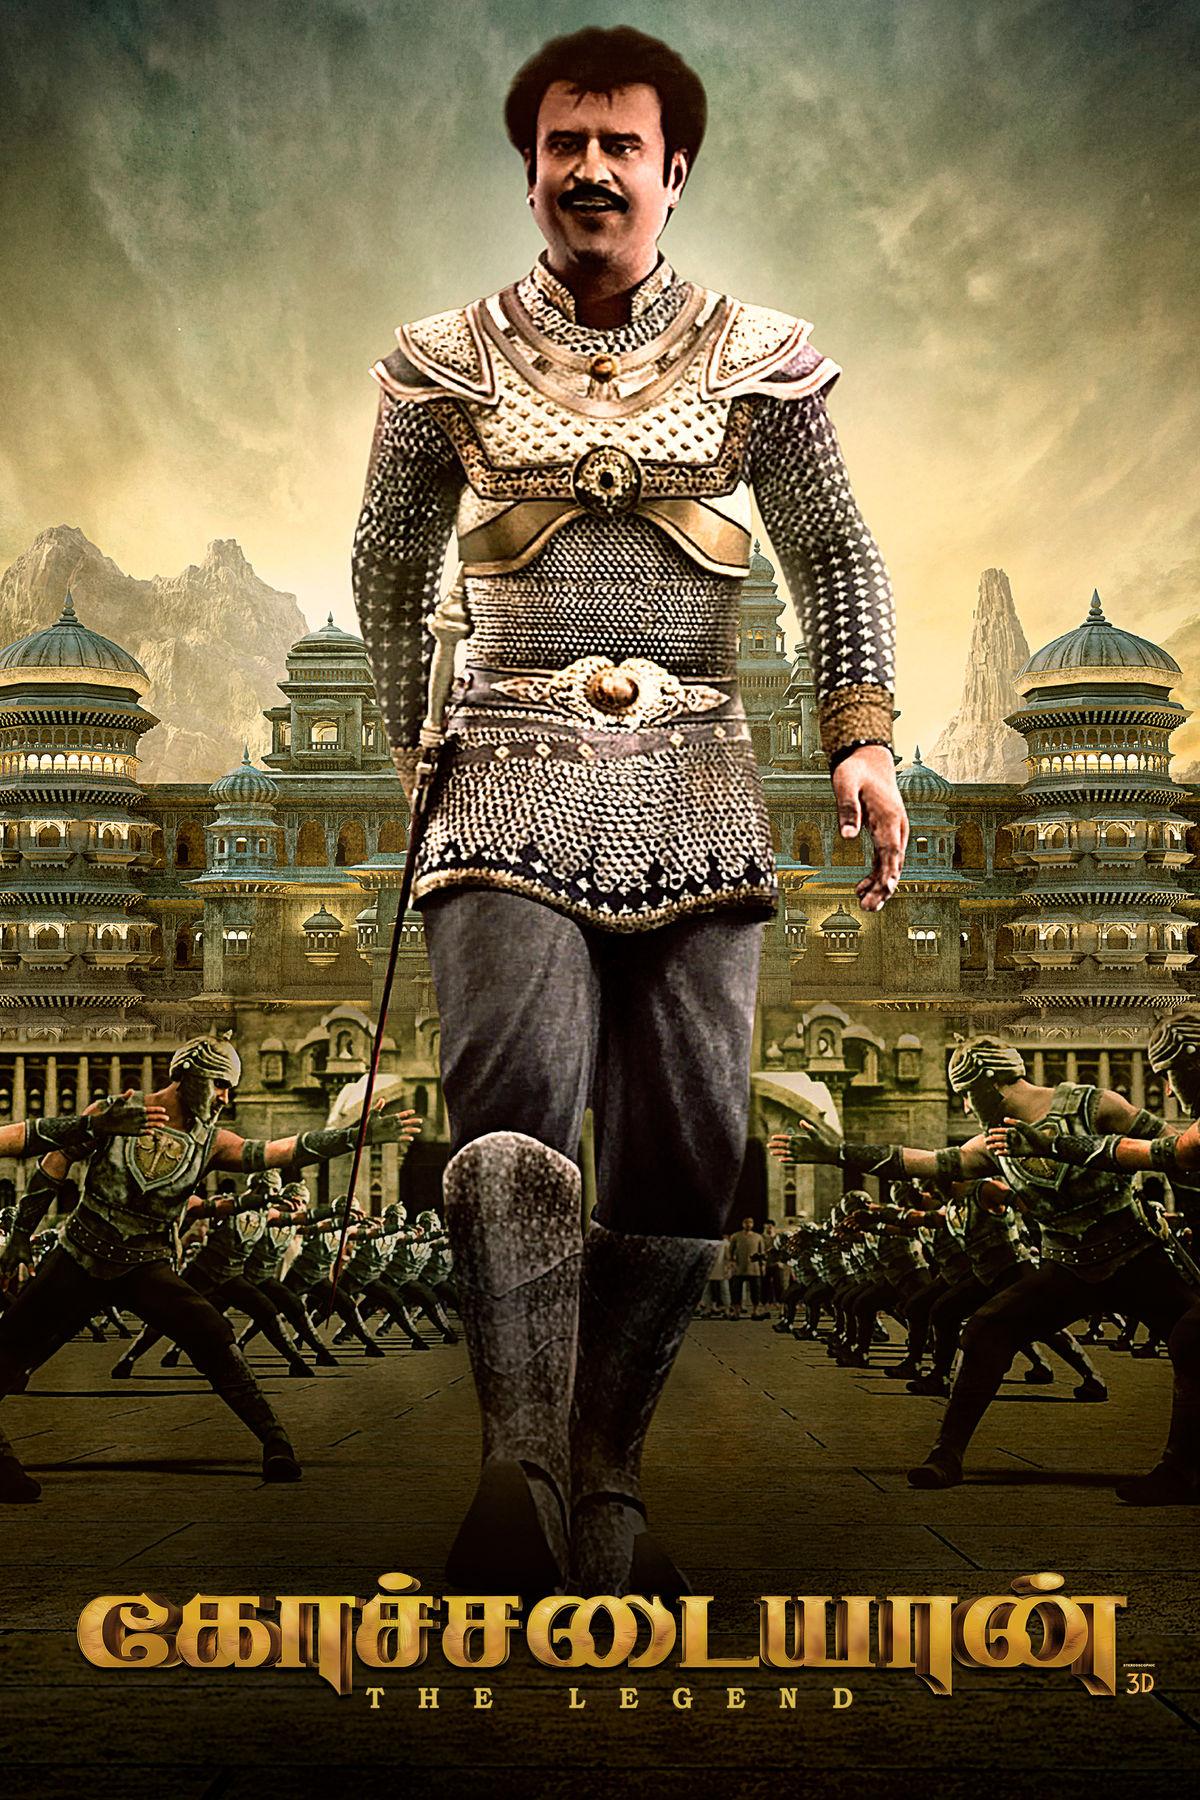 Soundarya R Ashwin Best Movies, TV Shows and Web Series List